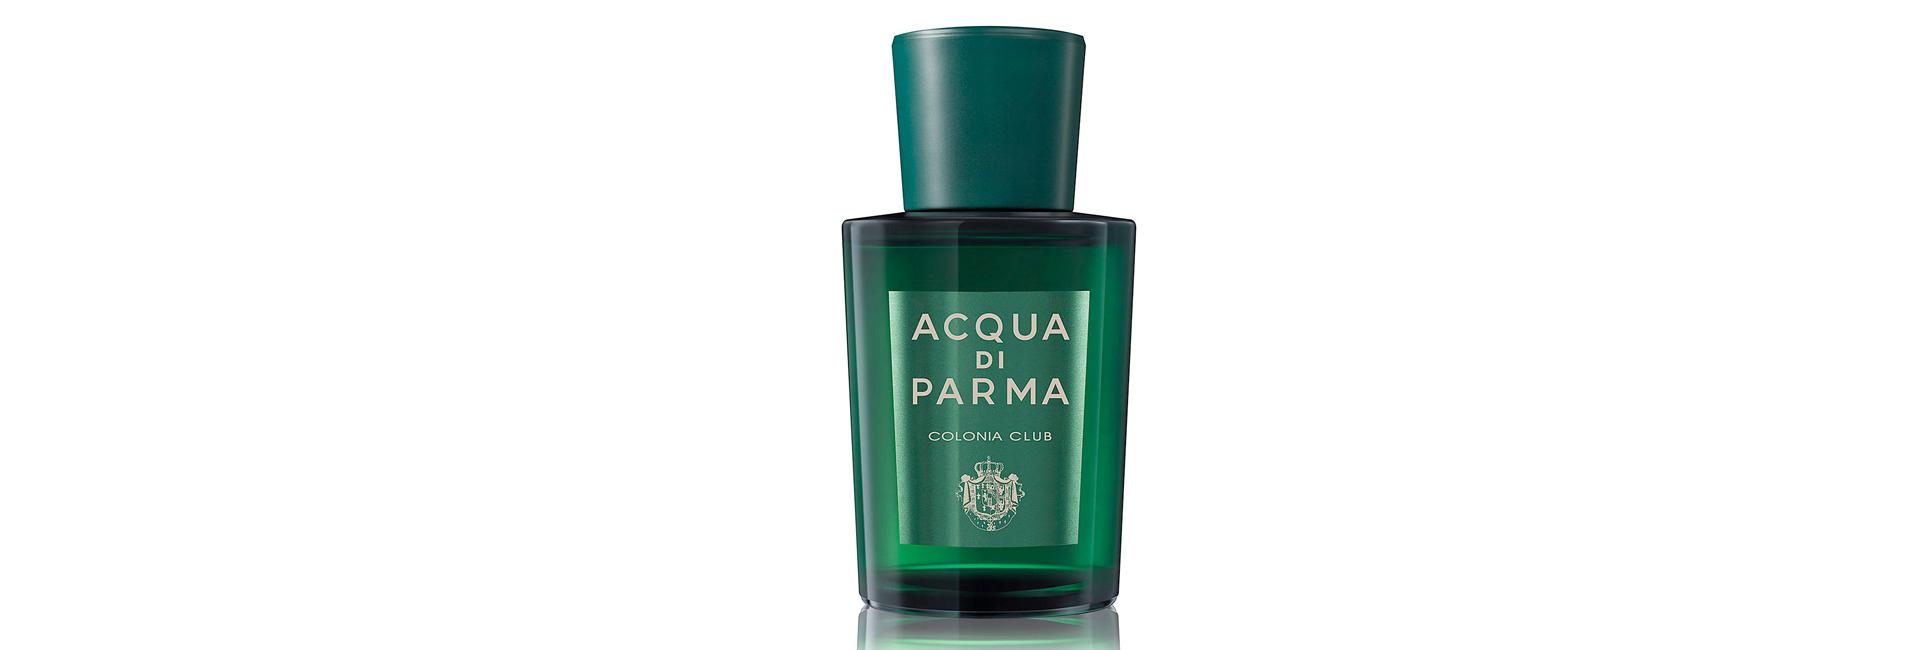 acqua-di-parma-colonia-club-blog-beaute-soin-parfum-homme